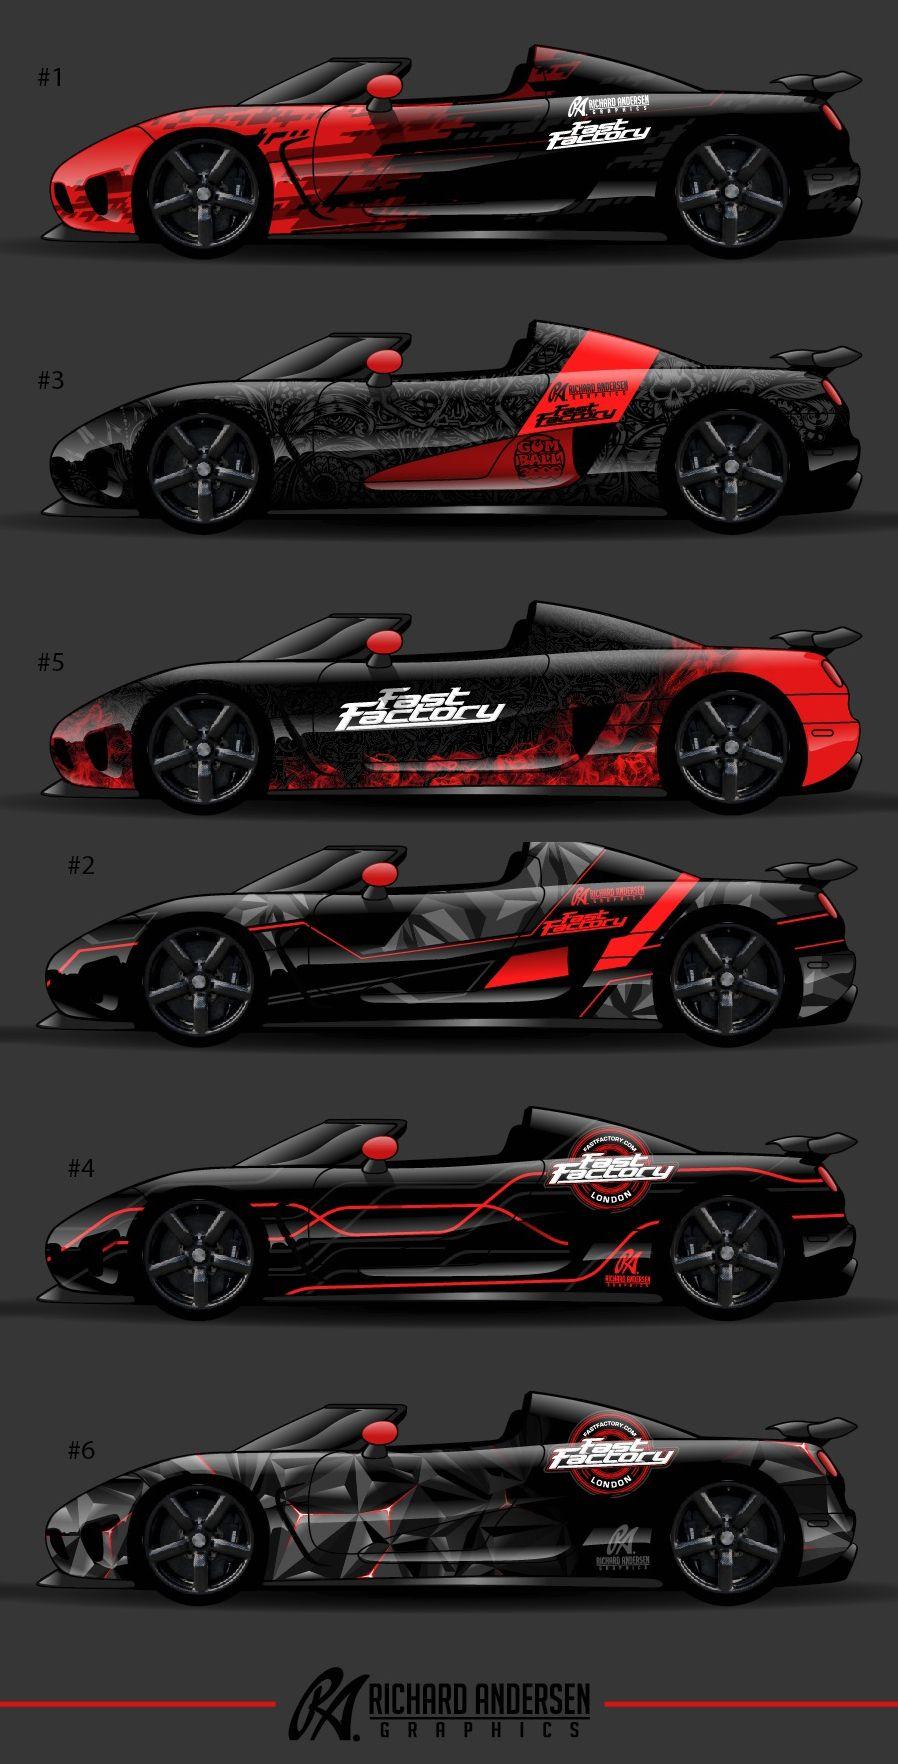 Pin By Jon Uyan On Race Car Paint Schemes Pinterest Cars Car